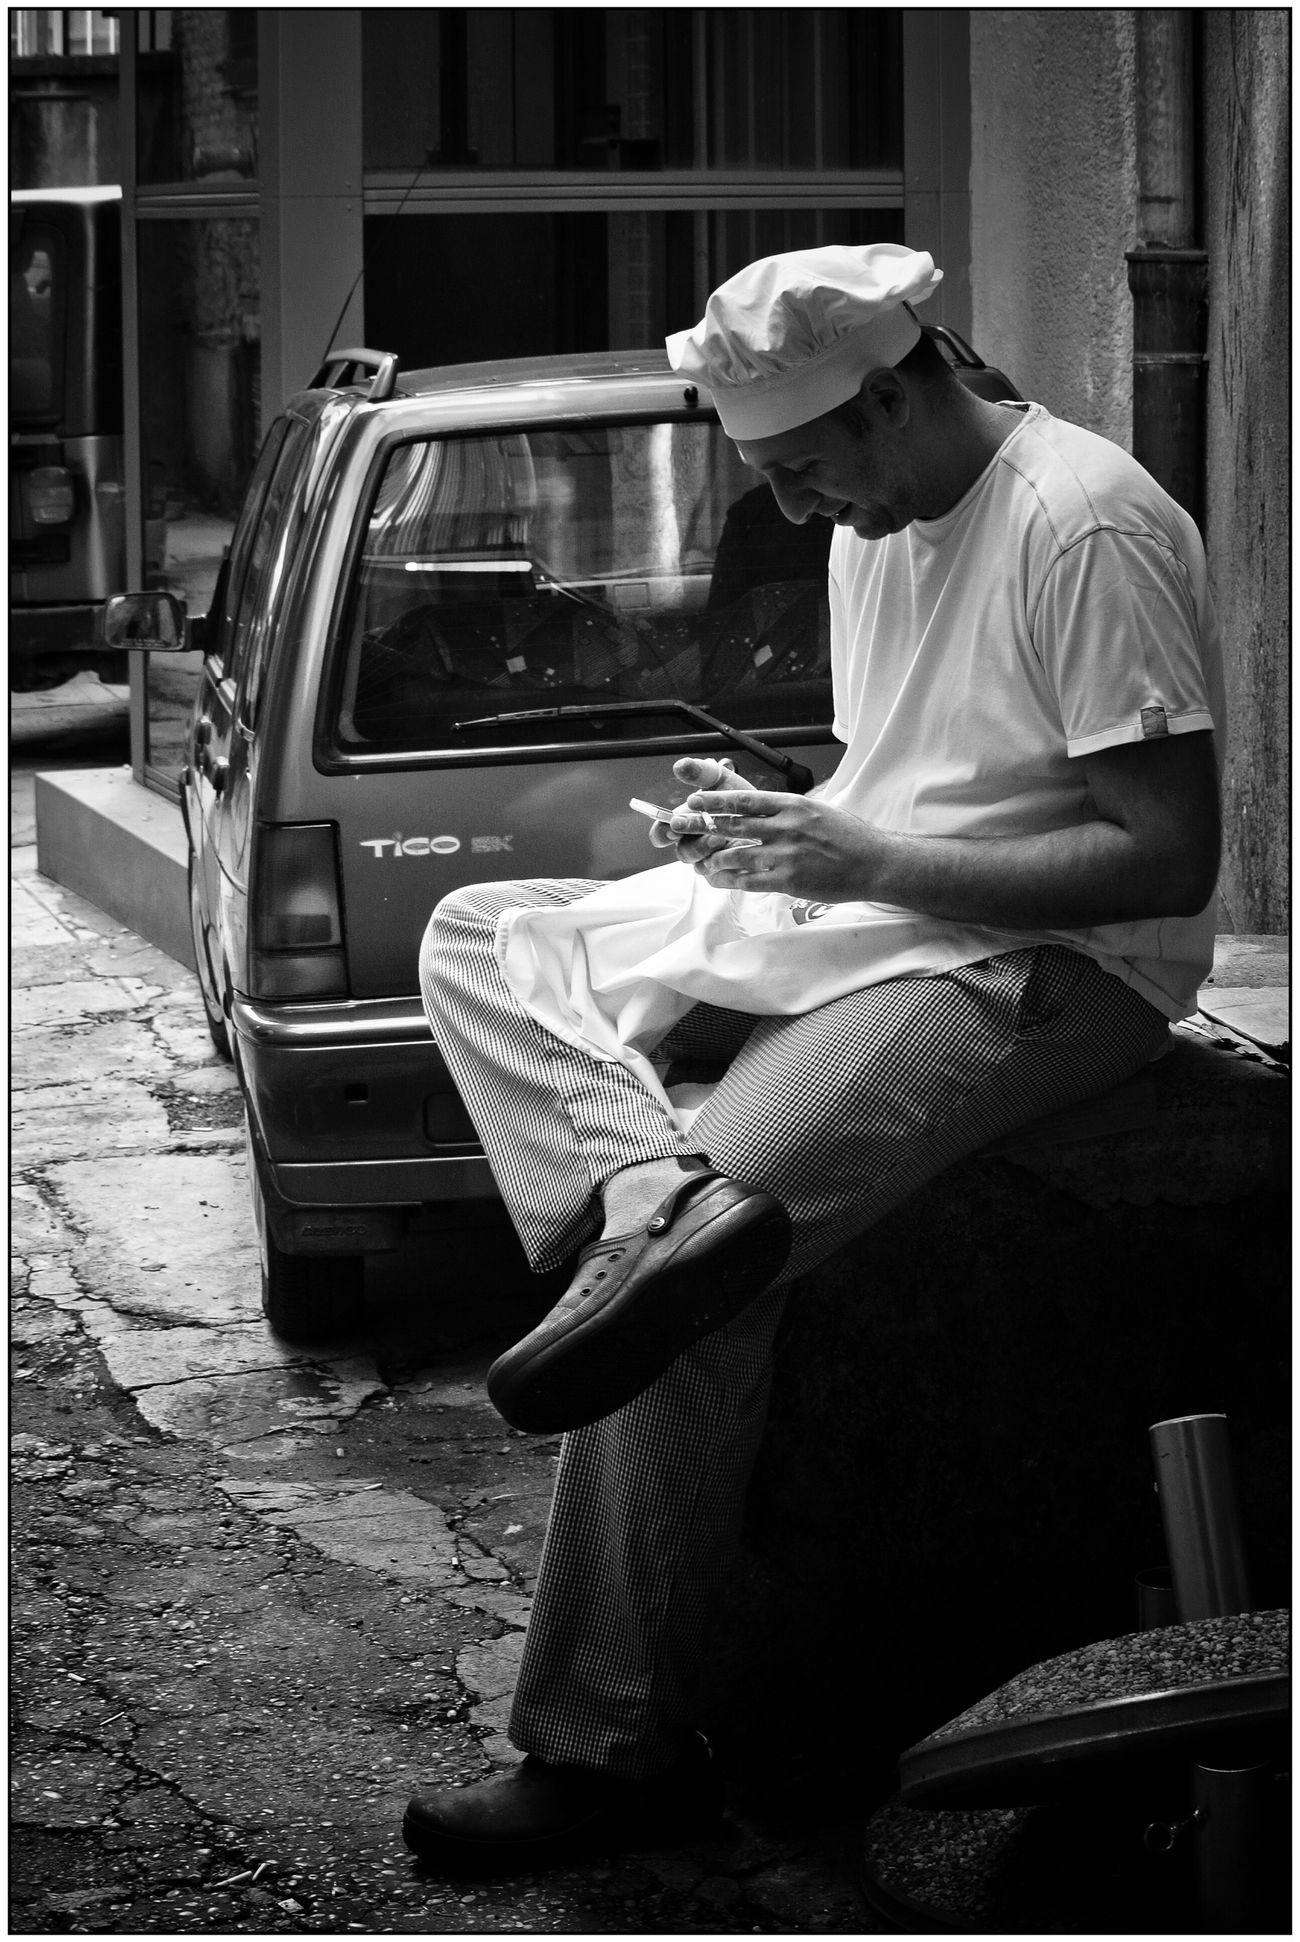 break Nikon 1 V1 Blackandwhite Monochrome One Person Streetphotography Street Photography Streetphoto_bw B&w Street Photography